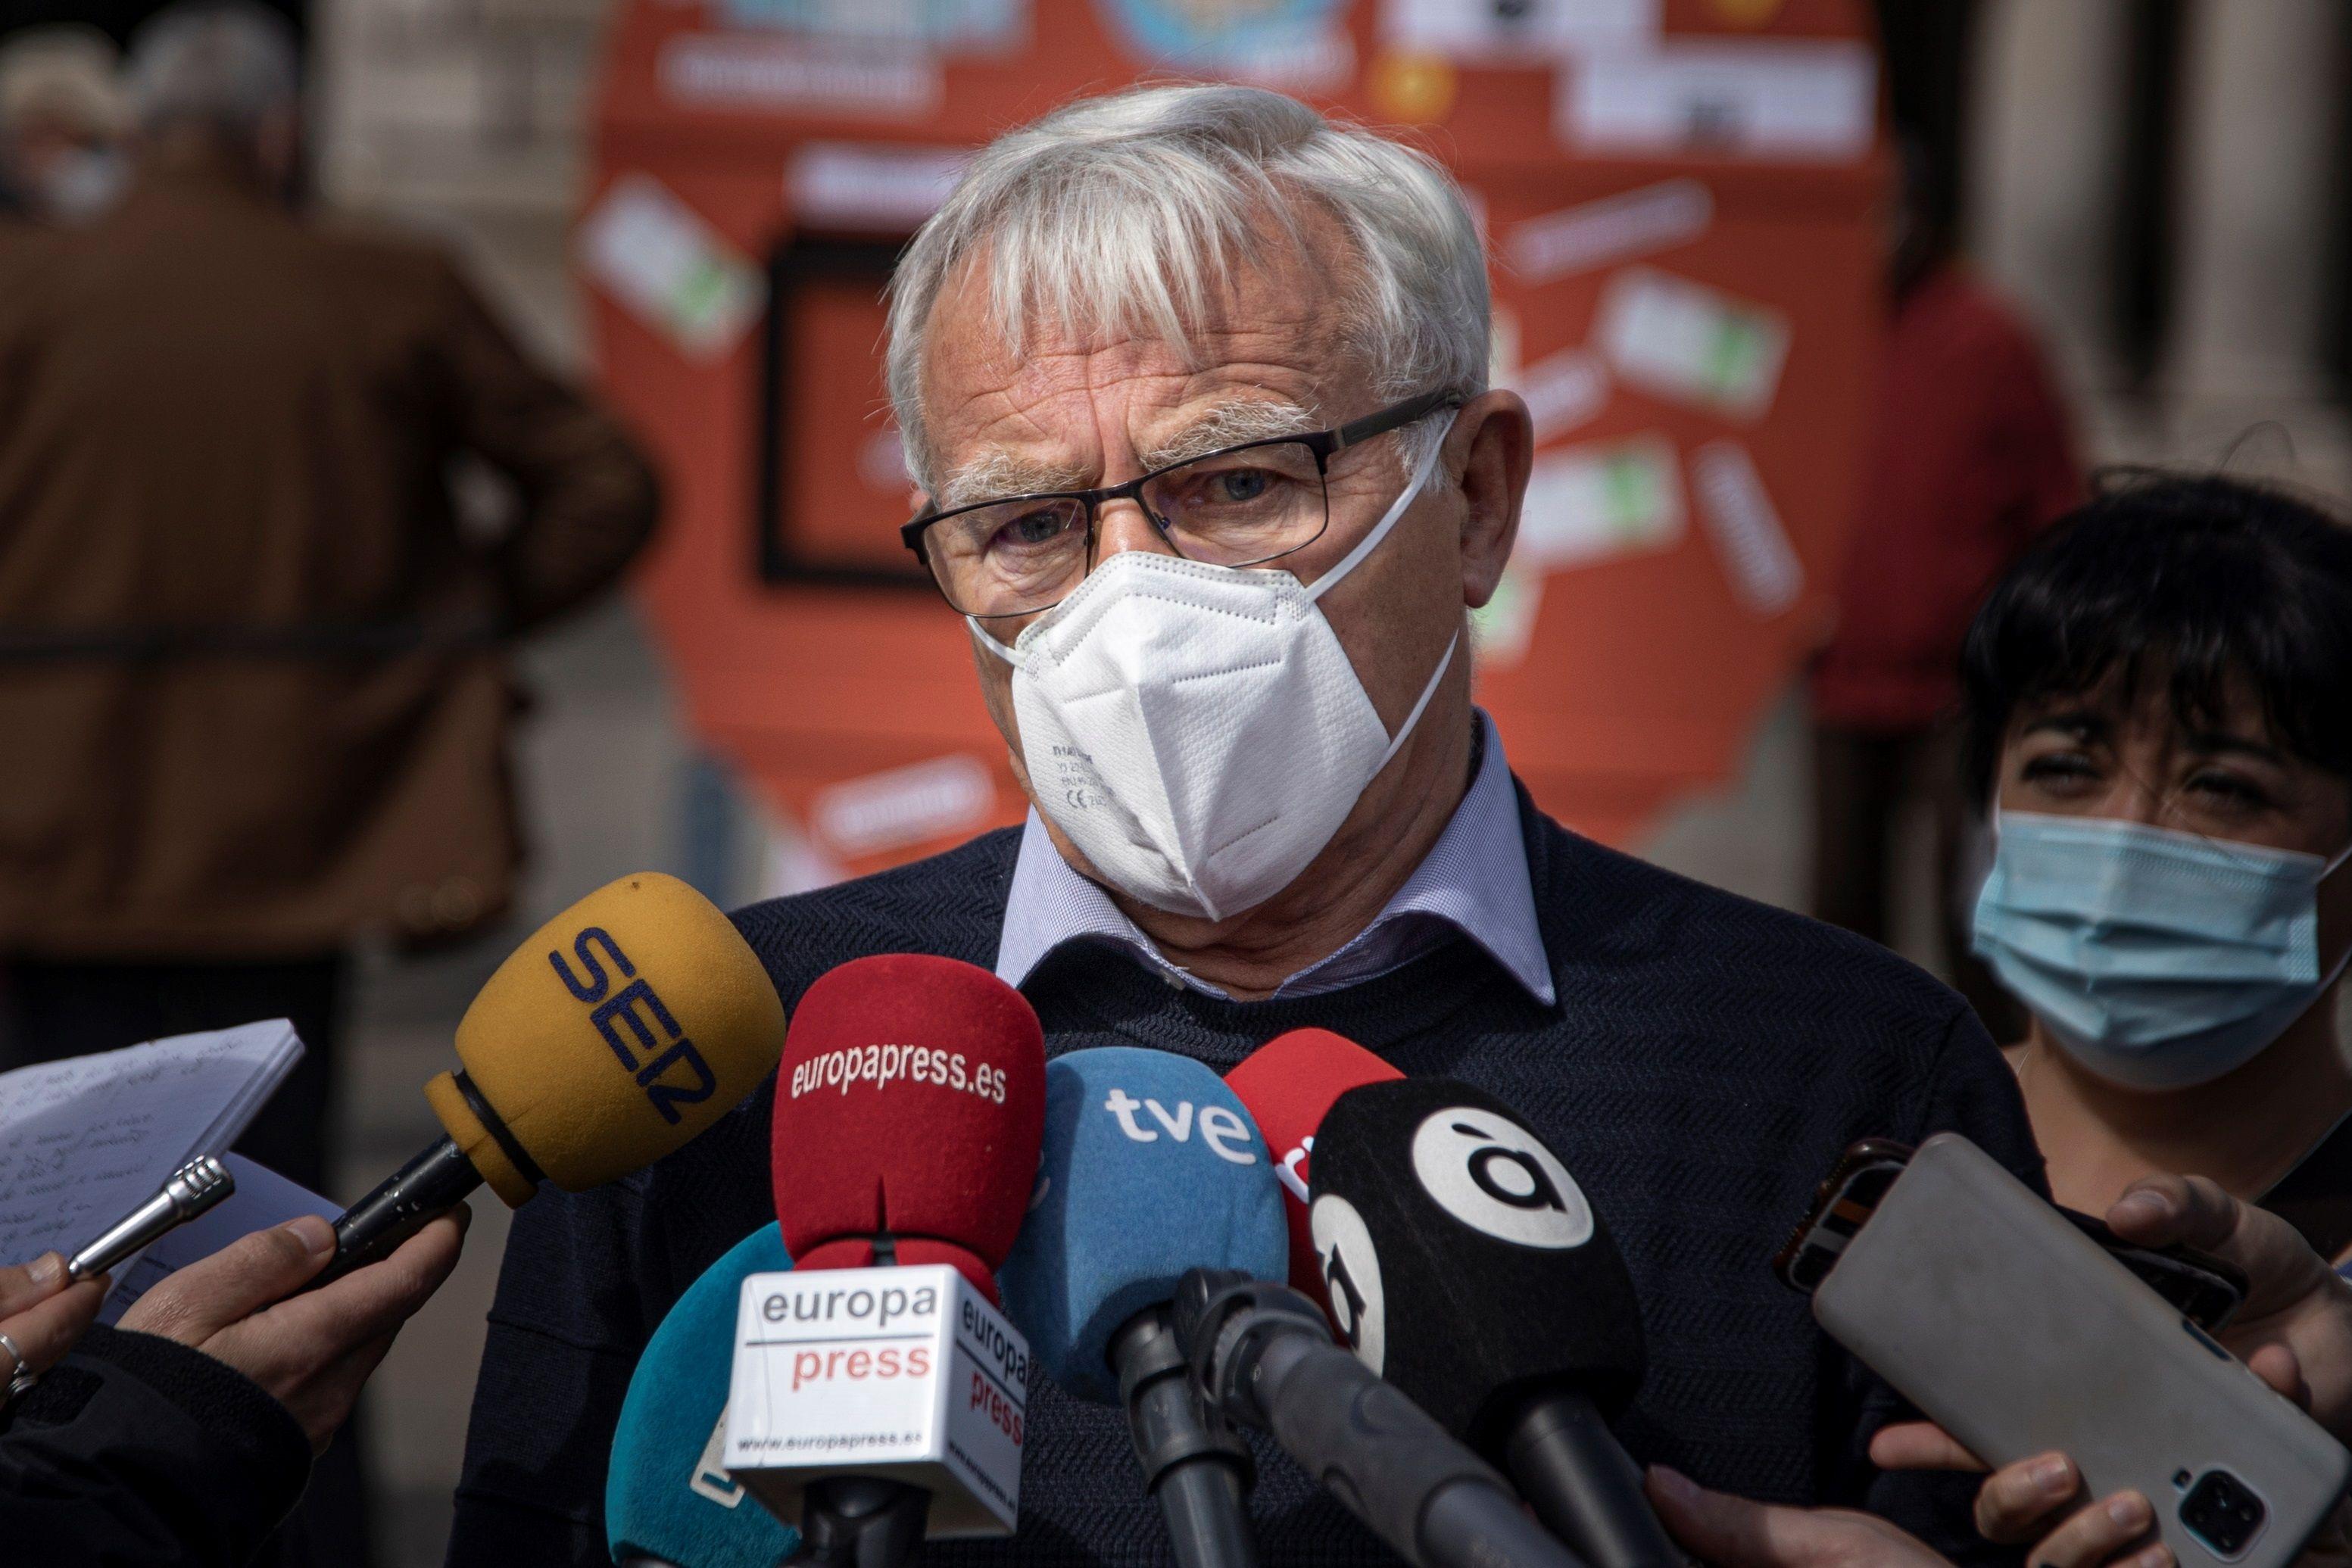 El alcalde de Valencia,  Joan Ribó, en un acto esta mañana.